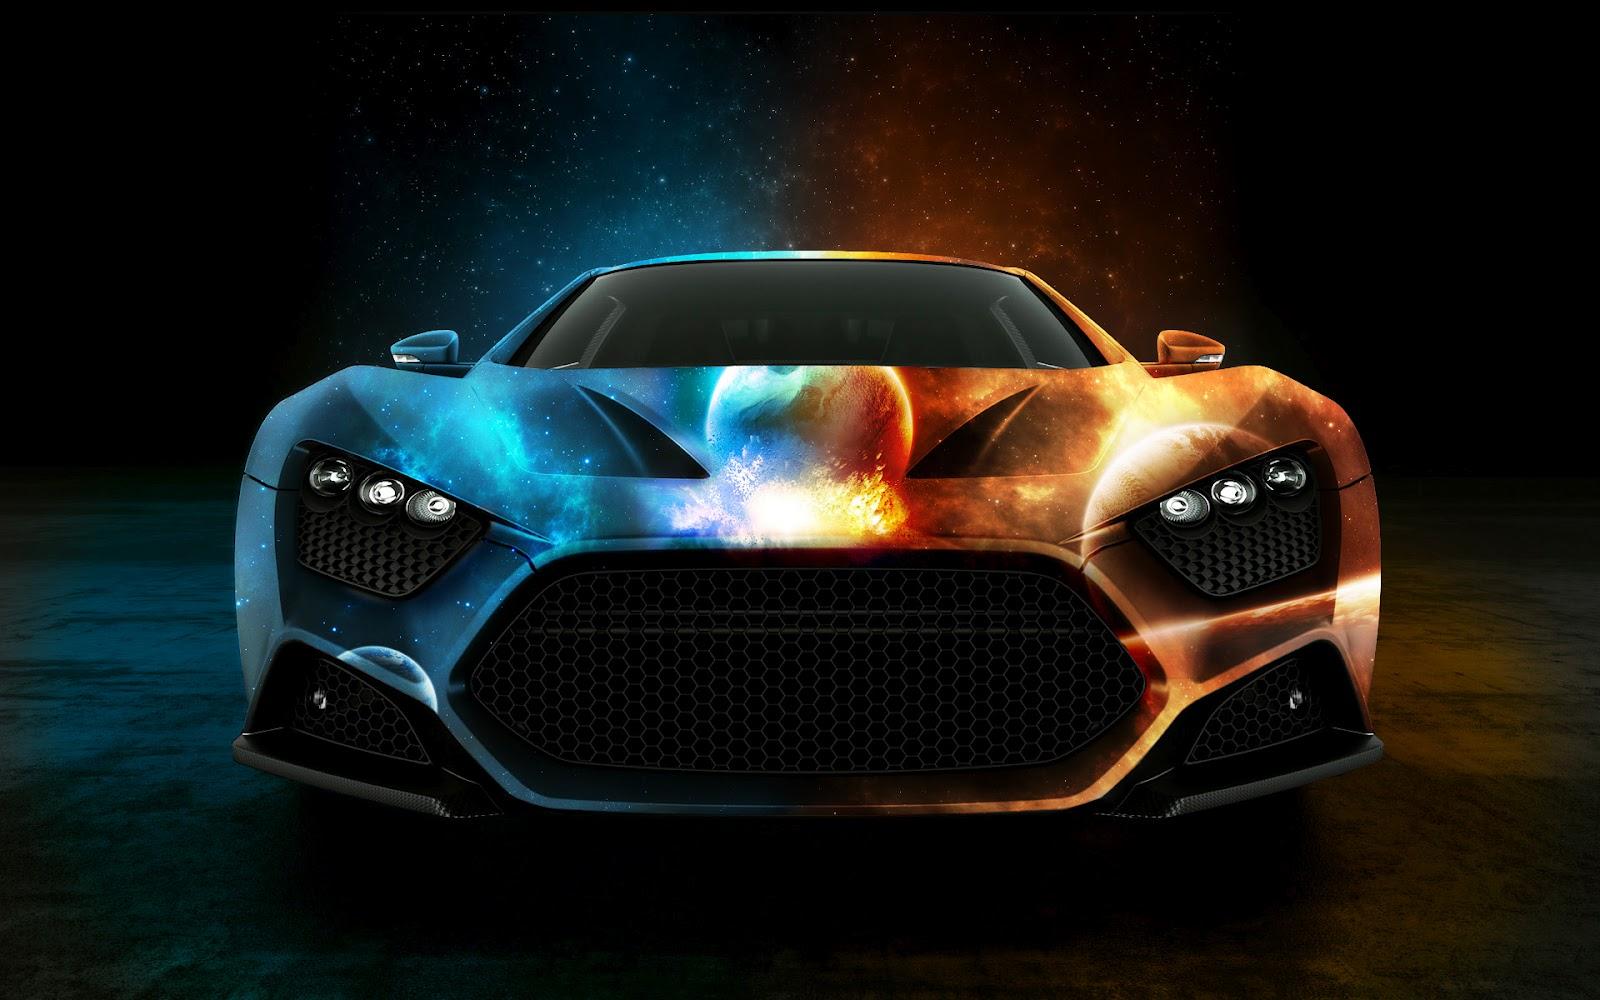 HD Car Wallpaper 1600x1000